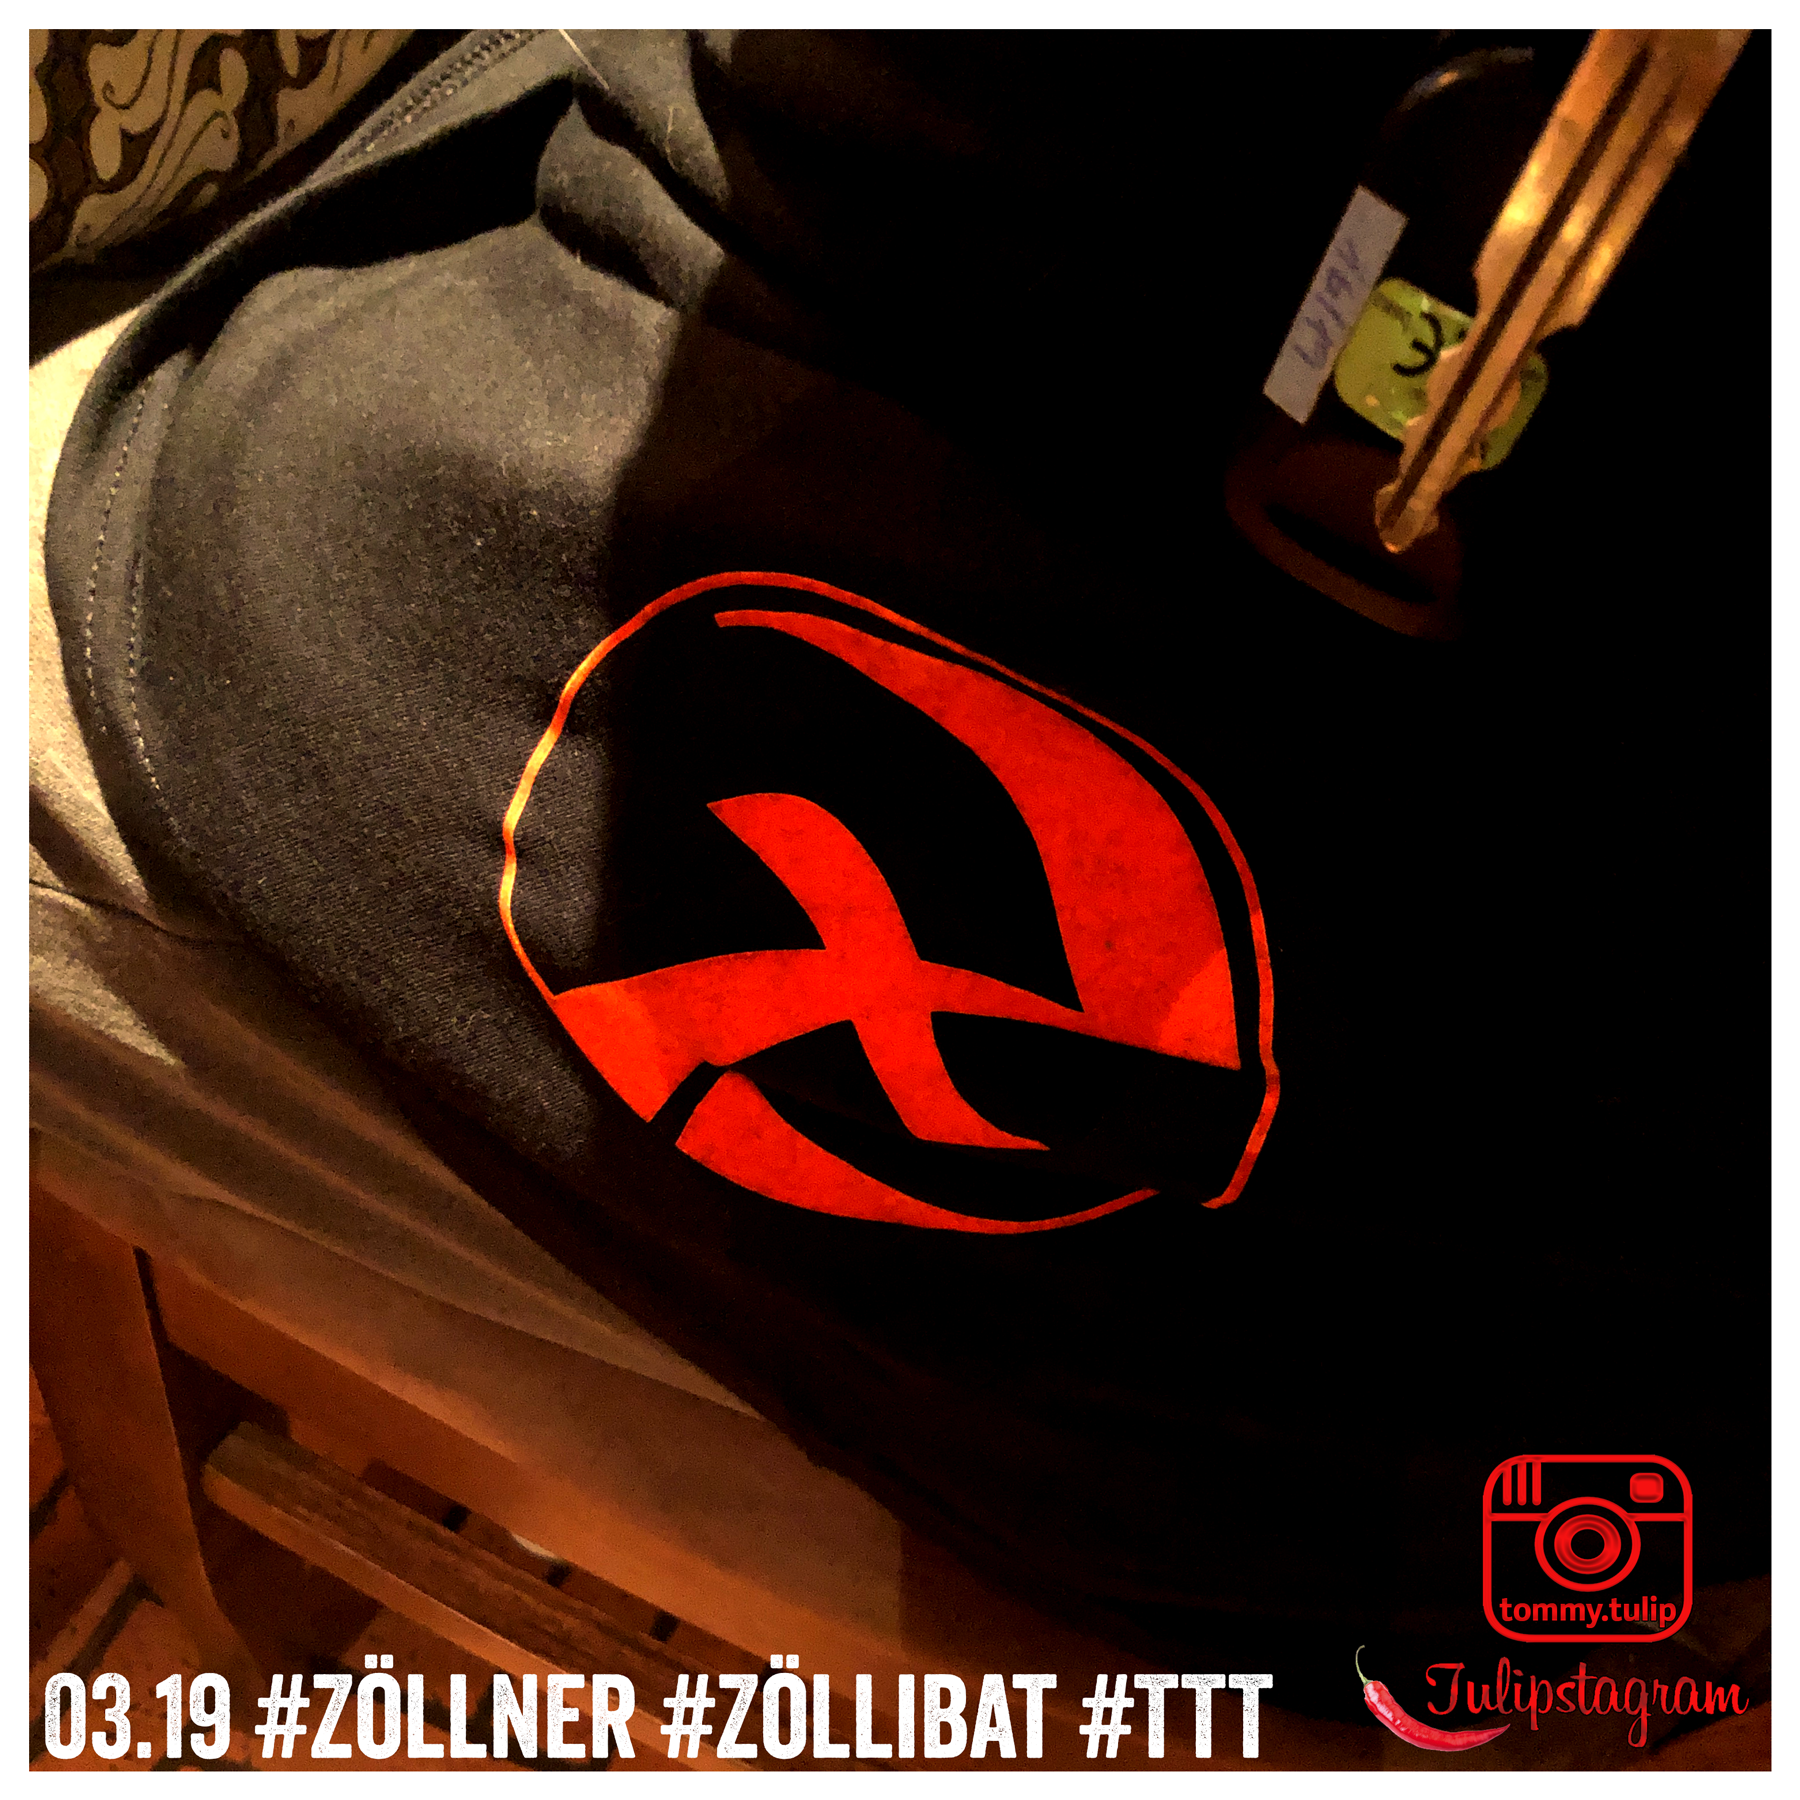 #Zöllner #Zöllibat #TTT Zöllner T-Shirts